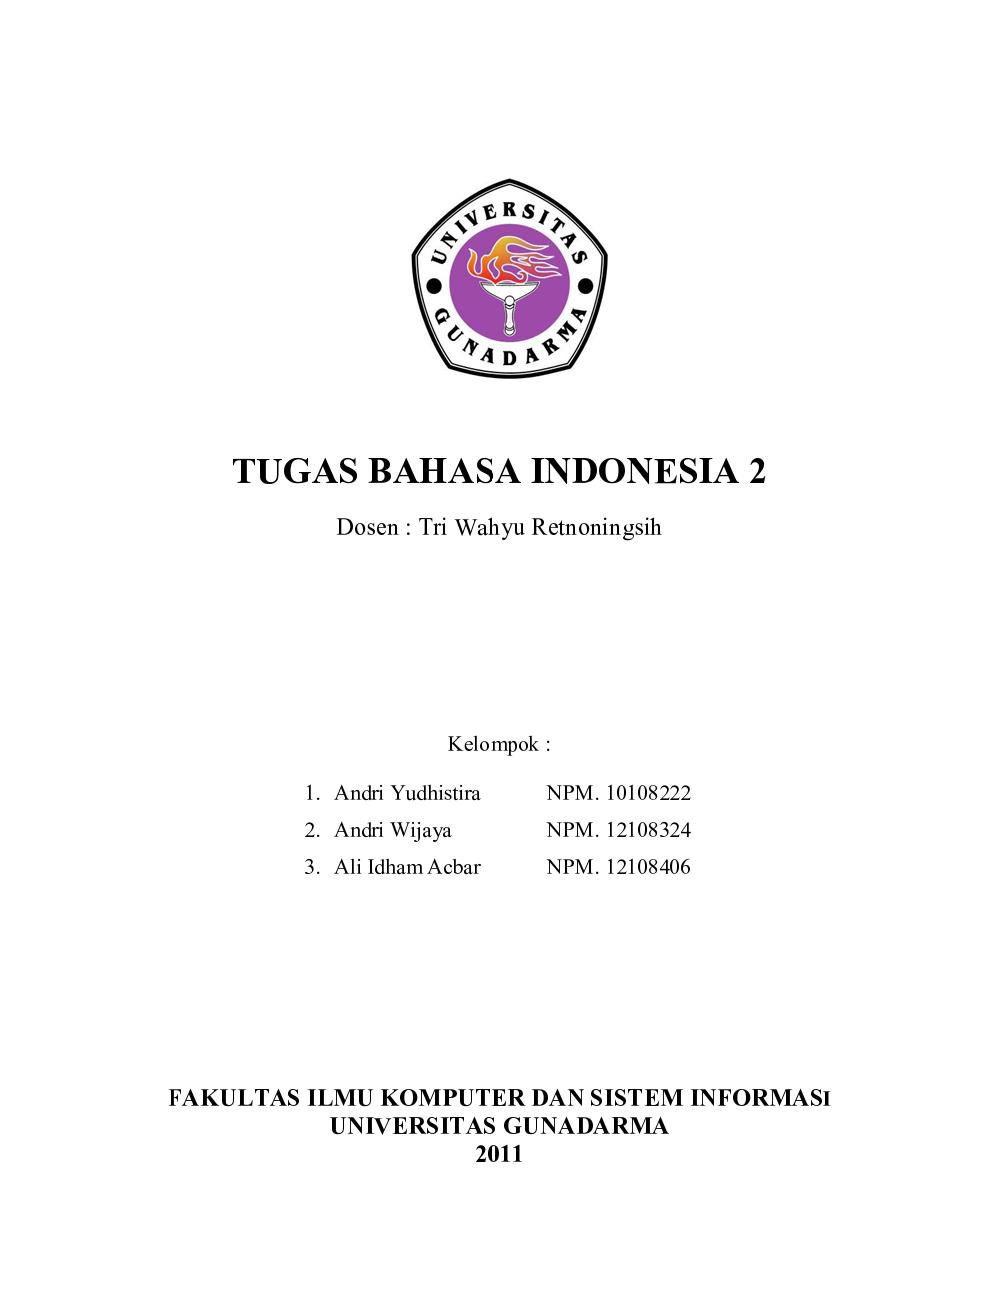 Tugas Bahasa Indonesia 2 – Makalah | Andri Yudhistira's Site